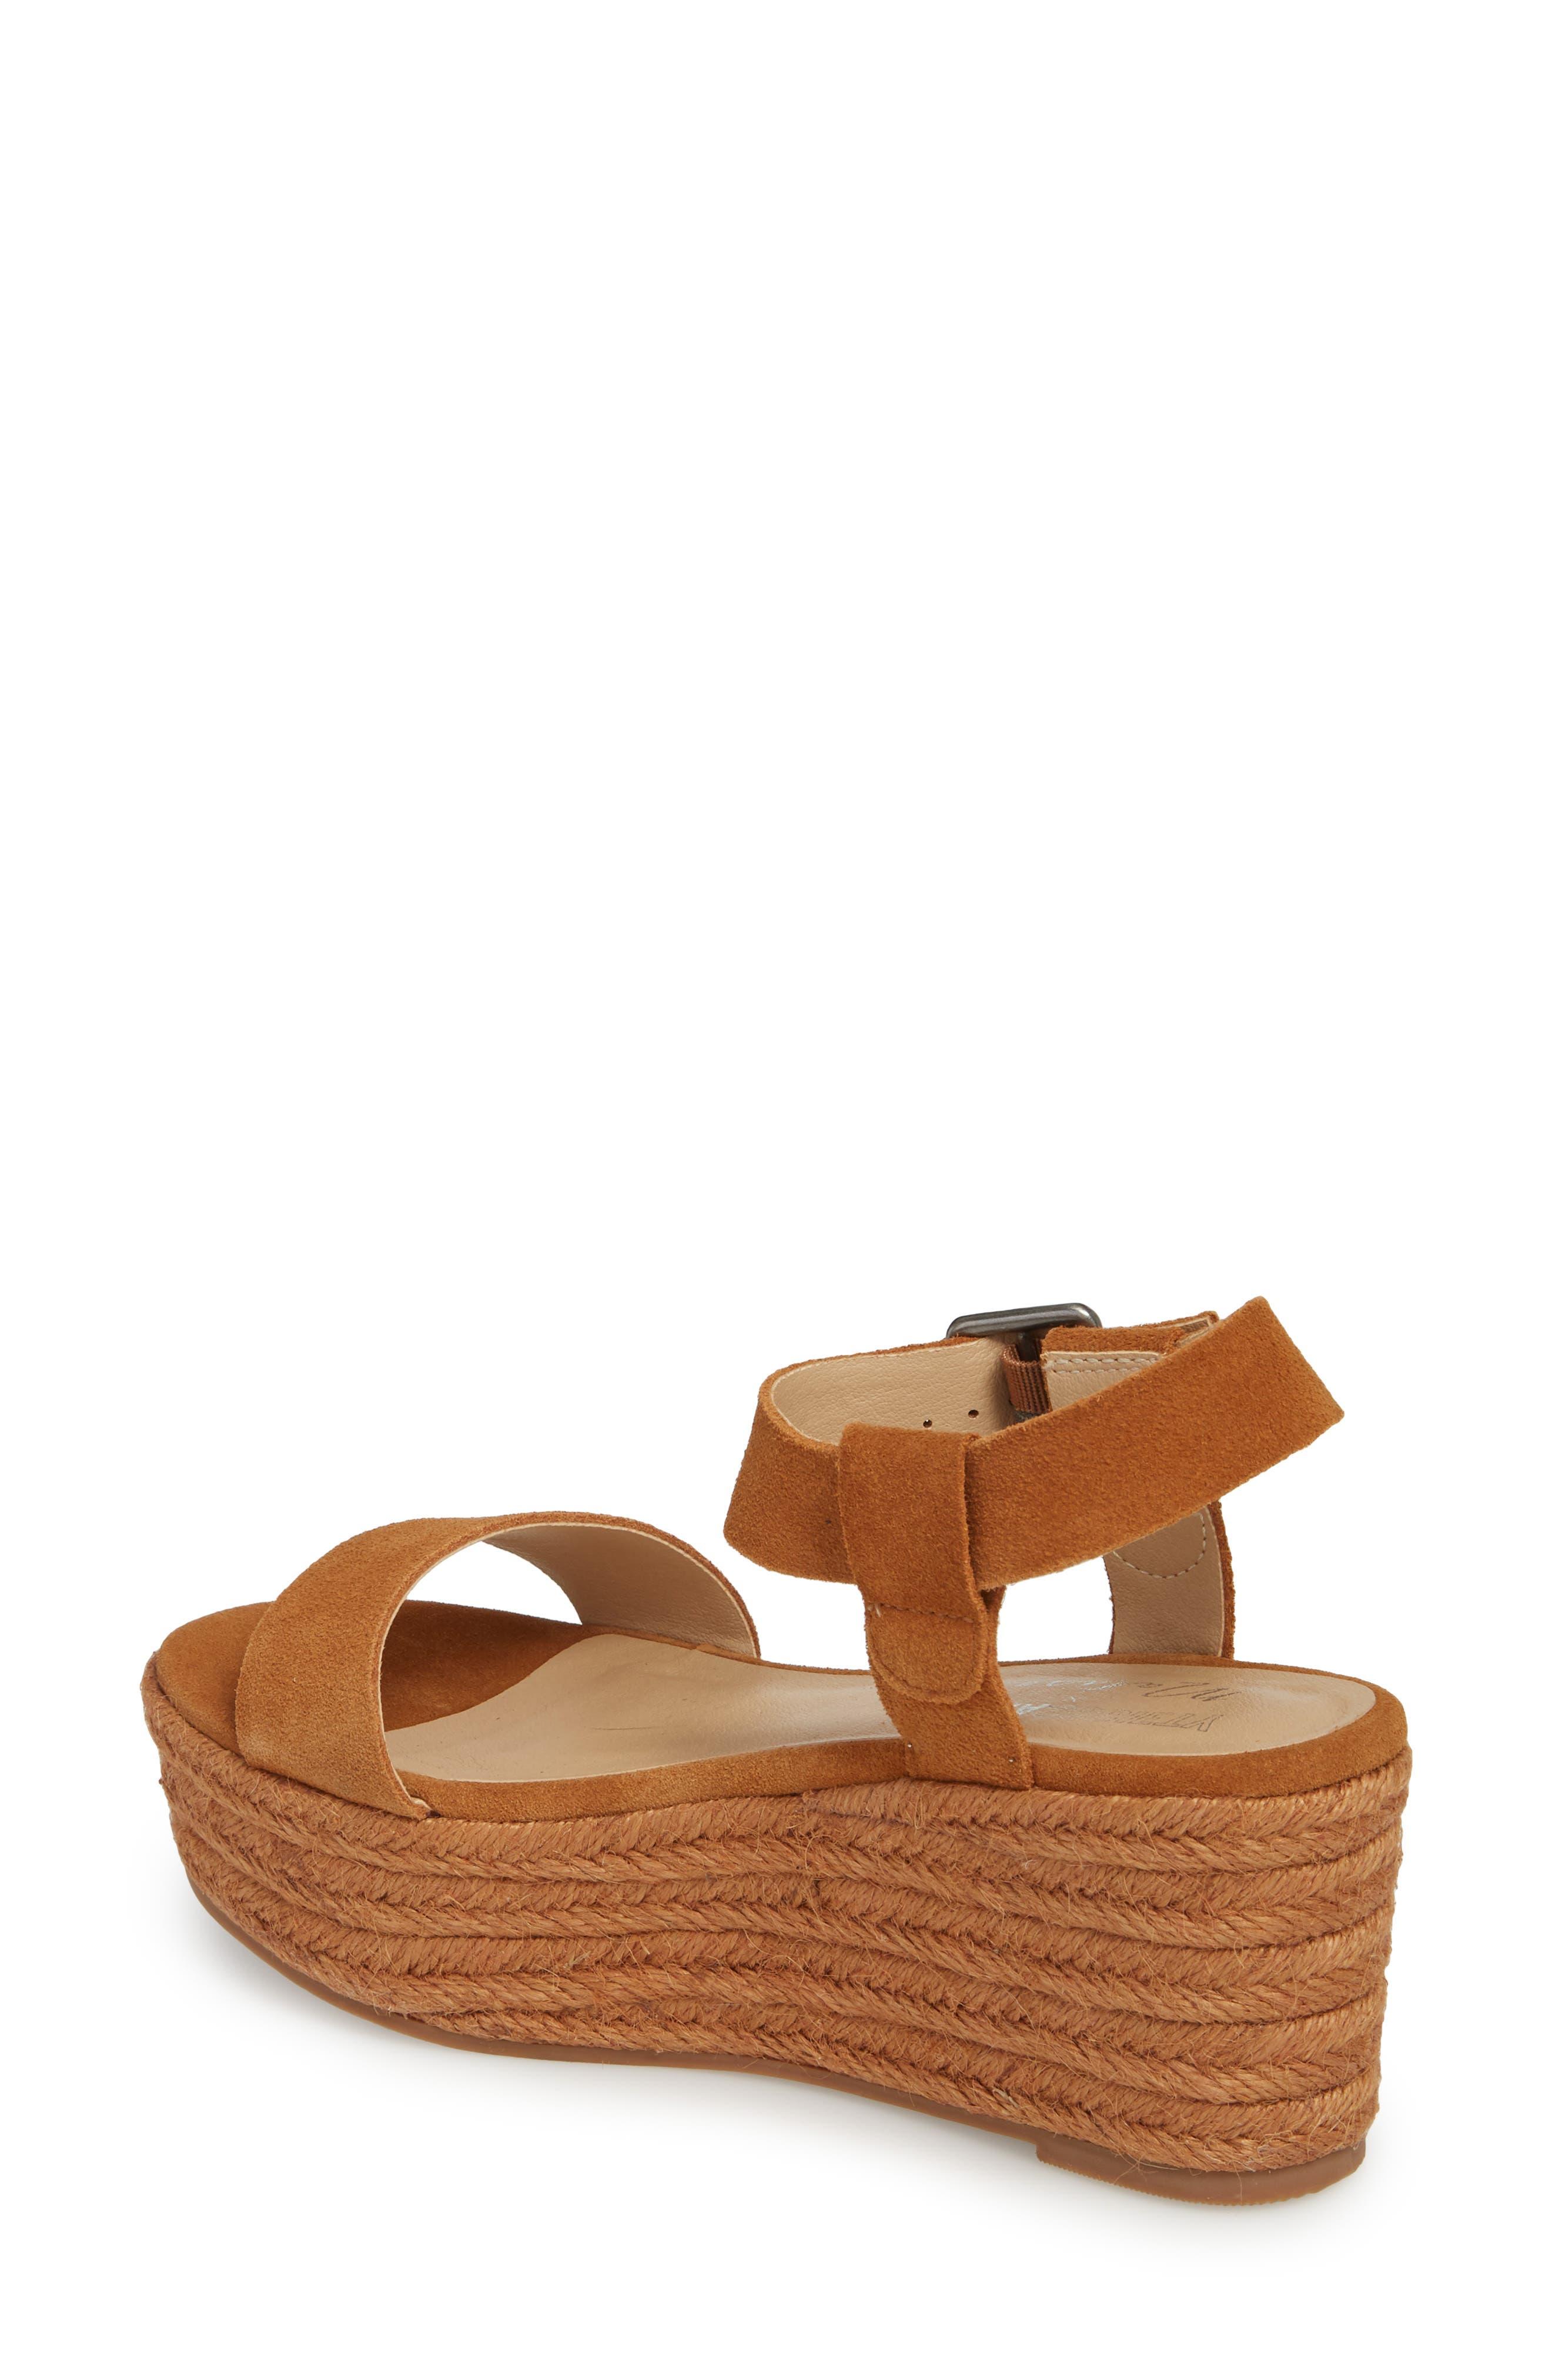 Amuse Society x Matisse Siena Wedge Sandal,                             Alternate thumbnail 5, color,